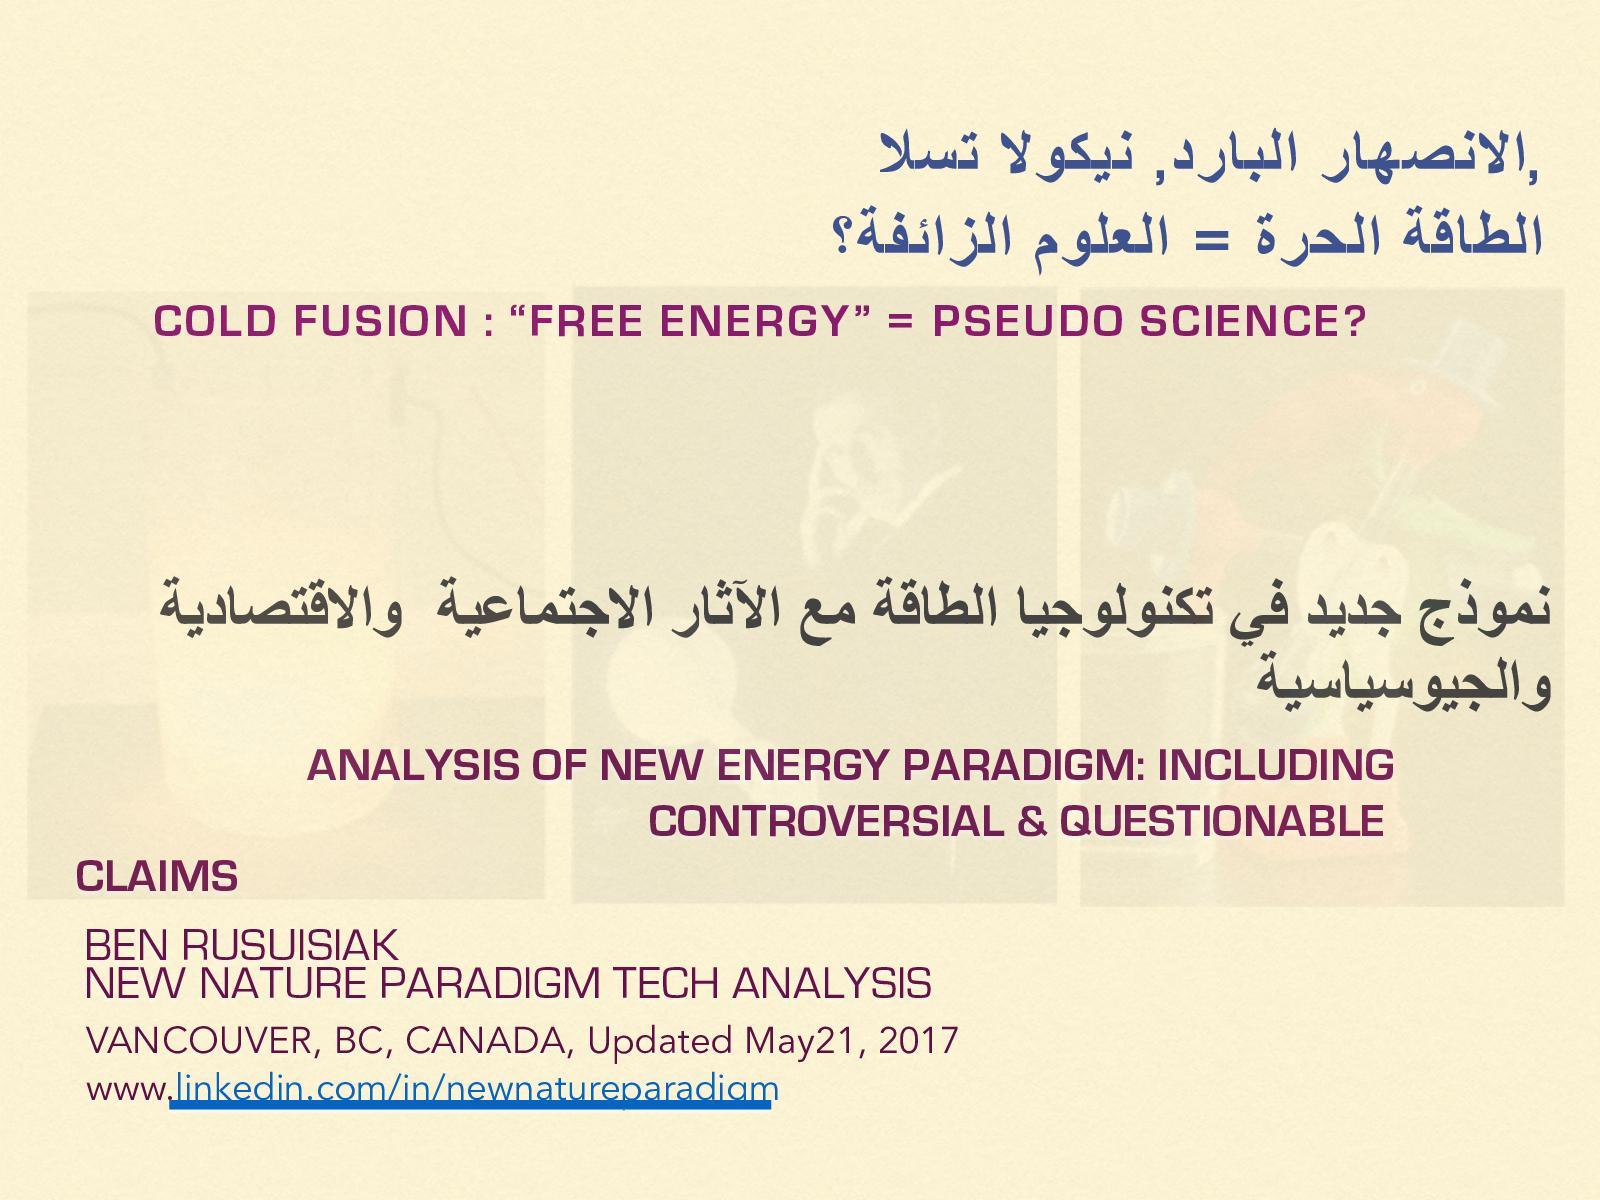 Calamo Cold Fusion Toshiba G7 Asd Wiring Diagram Free Energy Pseudo Science